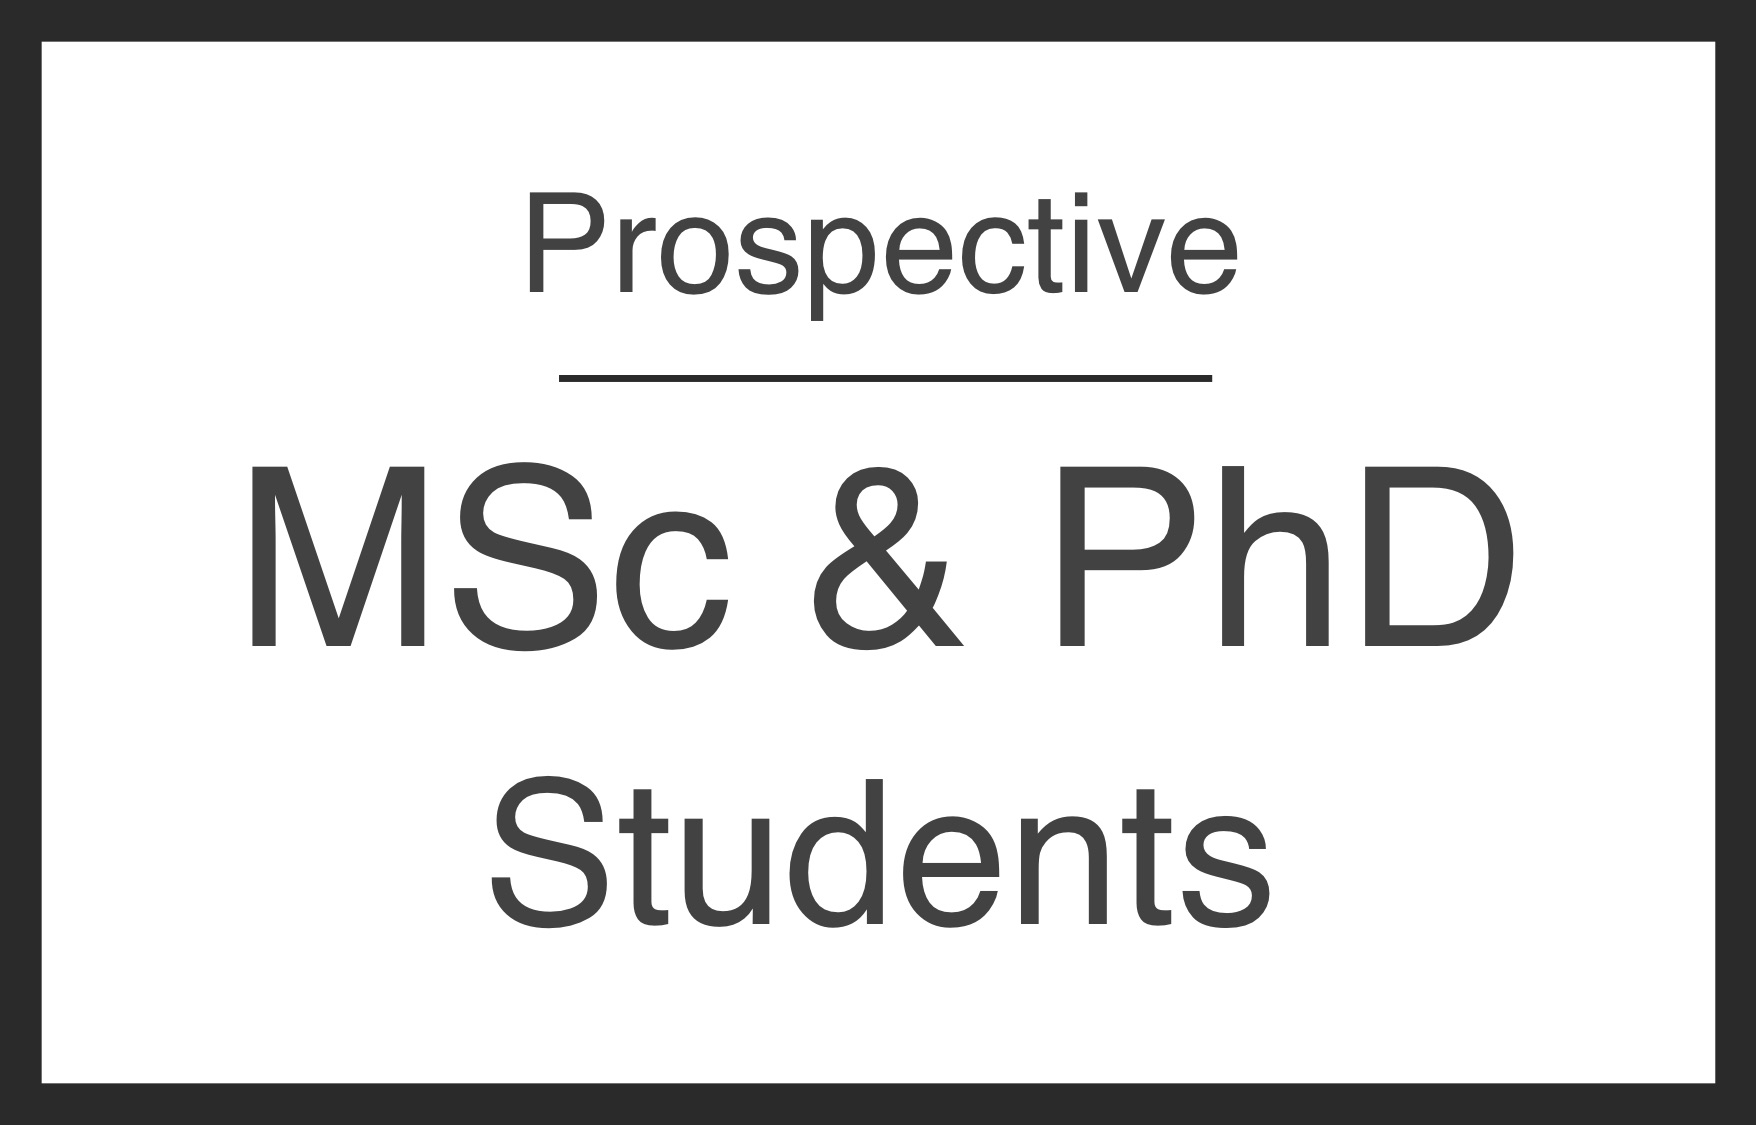 Prospective Grad Students